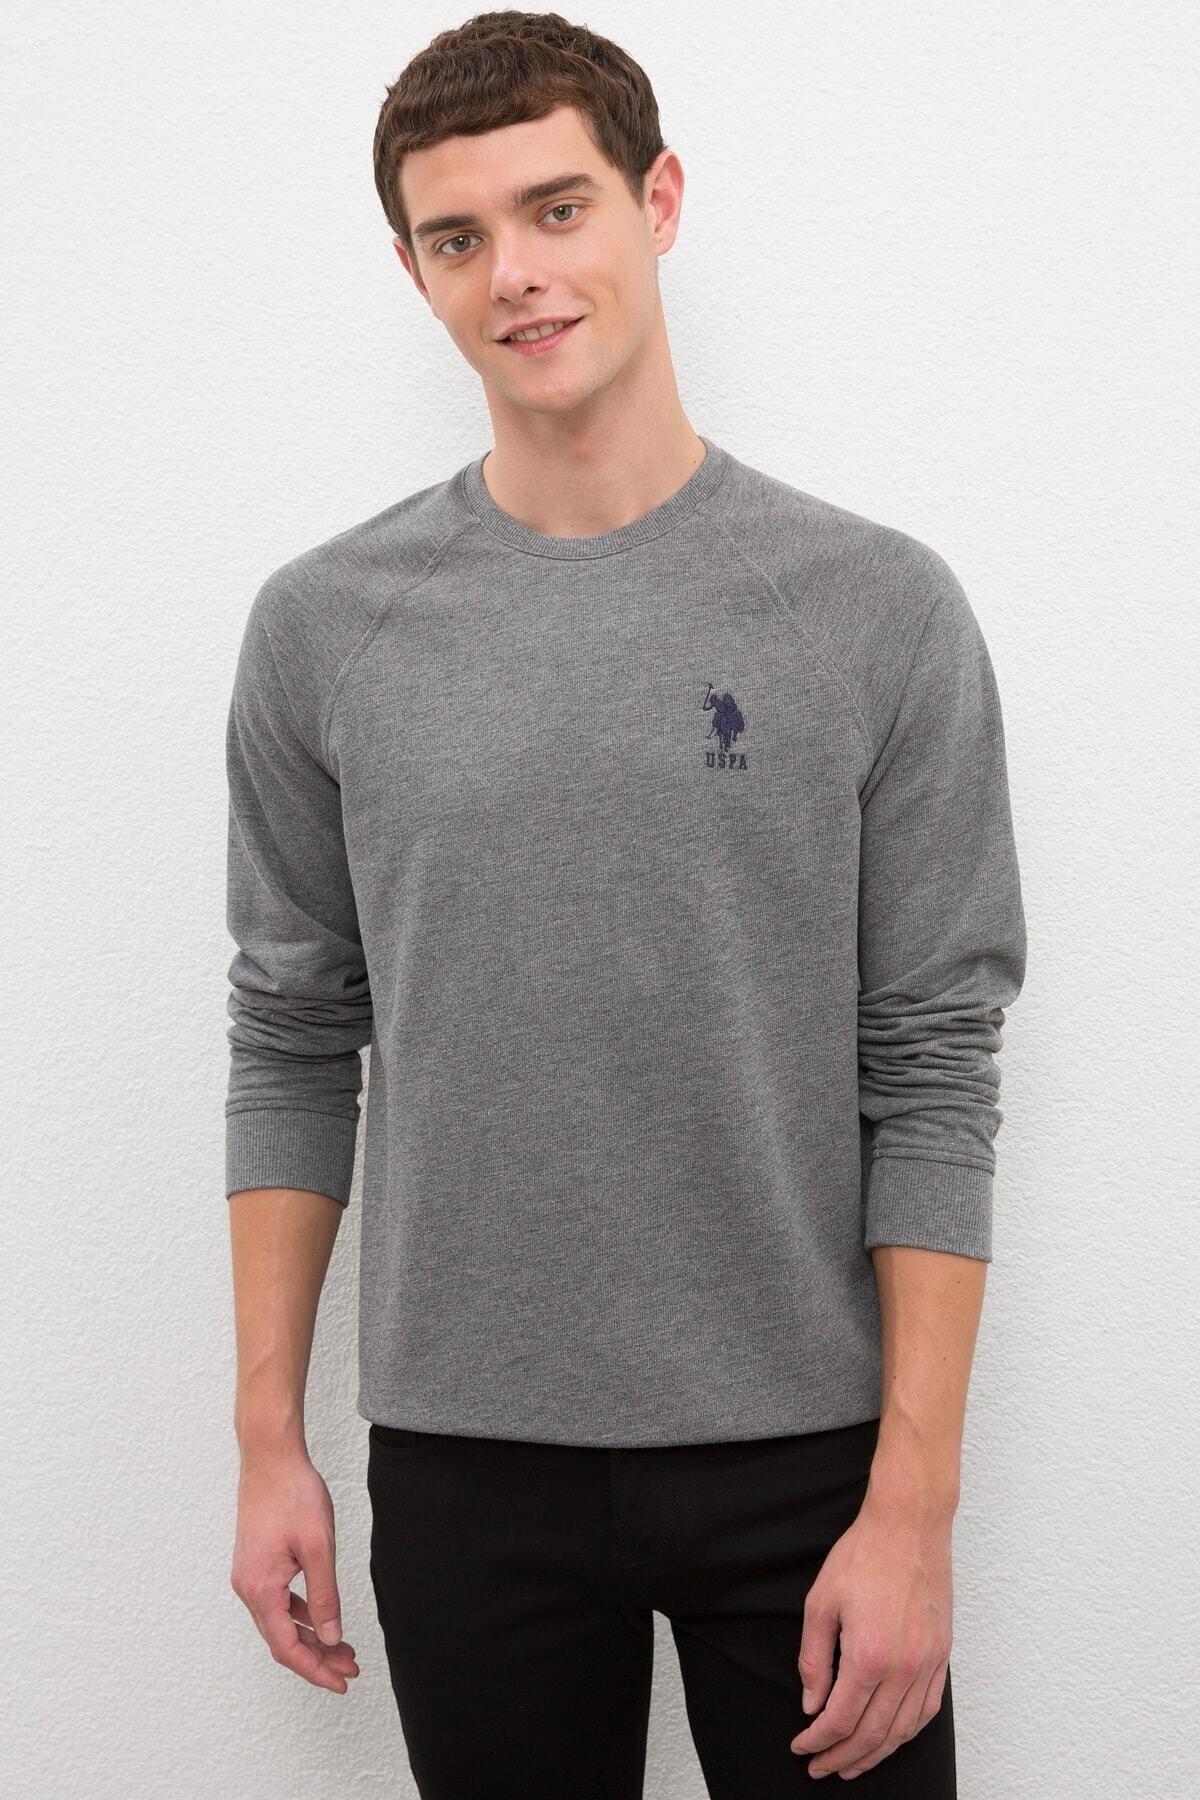 U.S. Polo Assn. Grı Erkek Sweatshirt 1